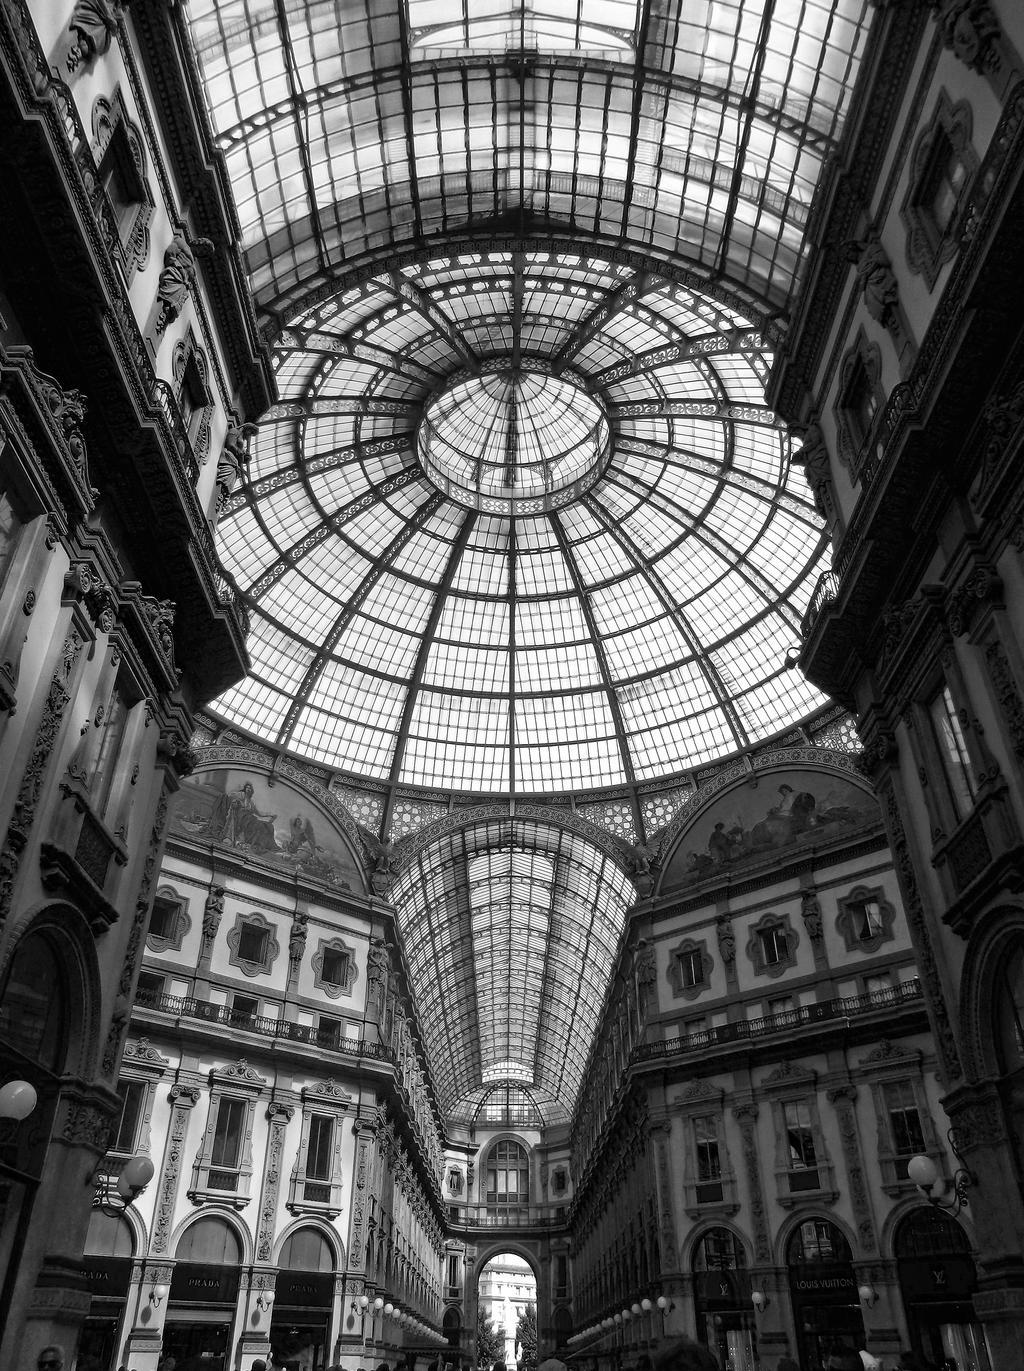 Galleria Vittorio Emanuele II - Milano by Amygurumi